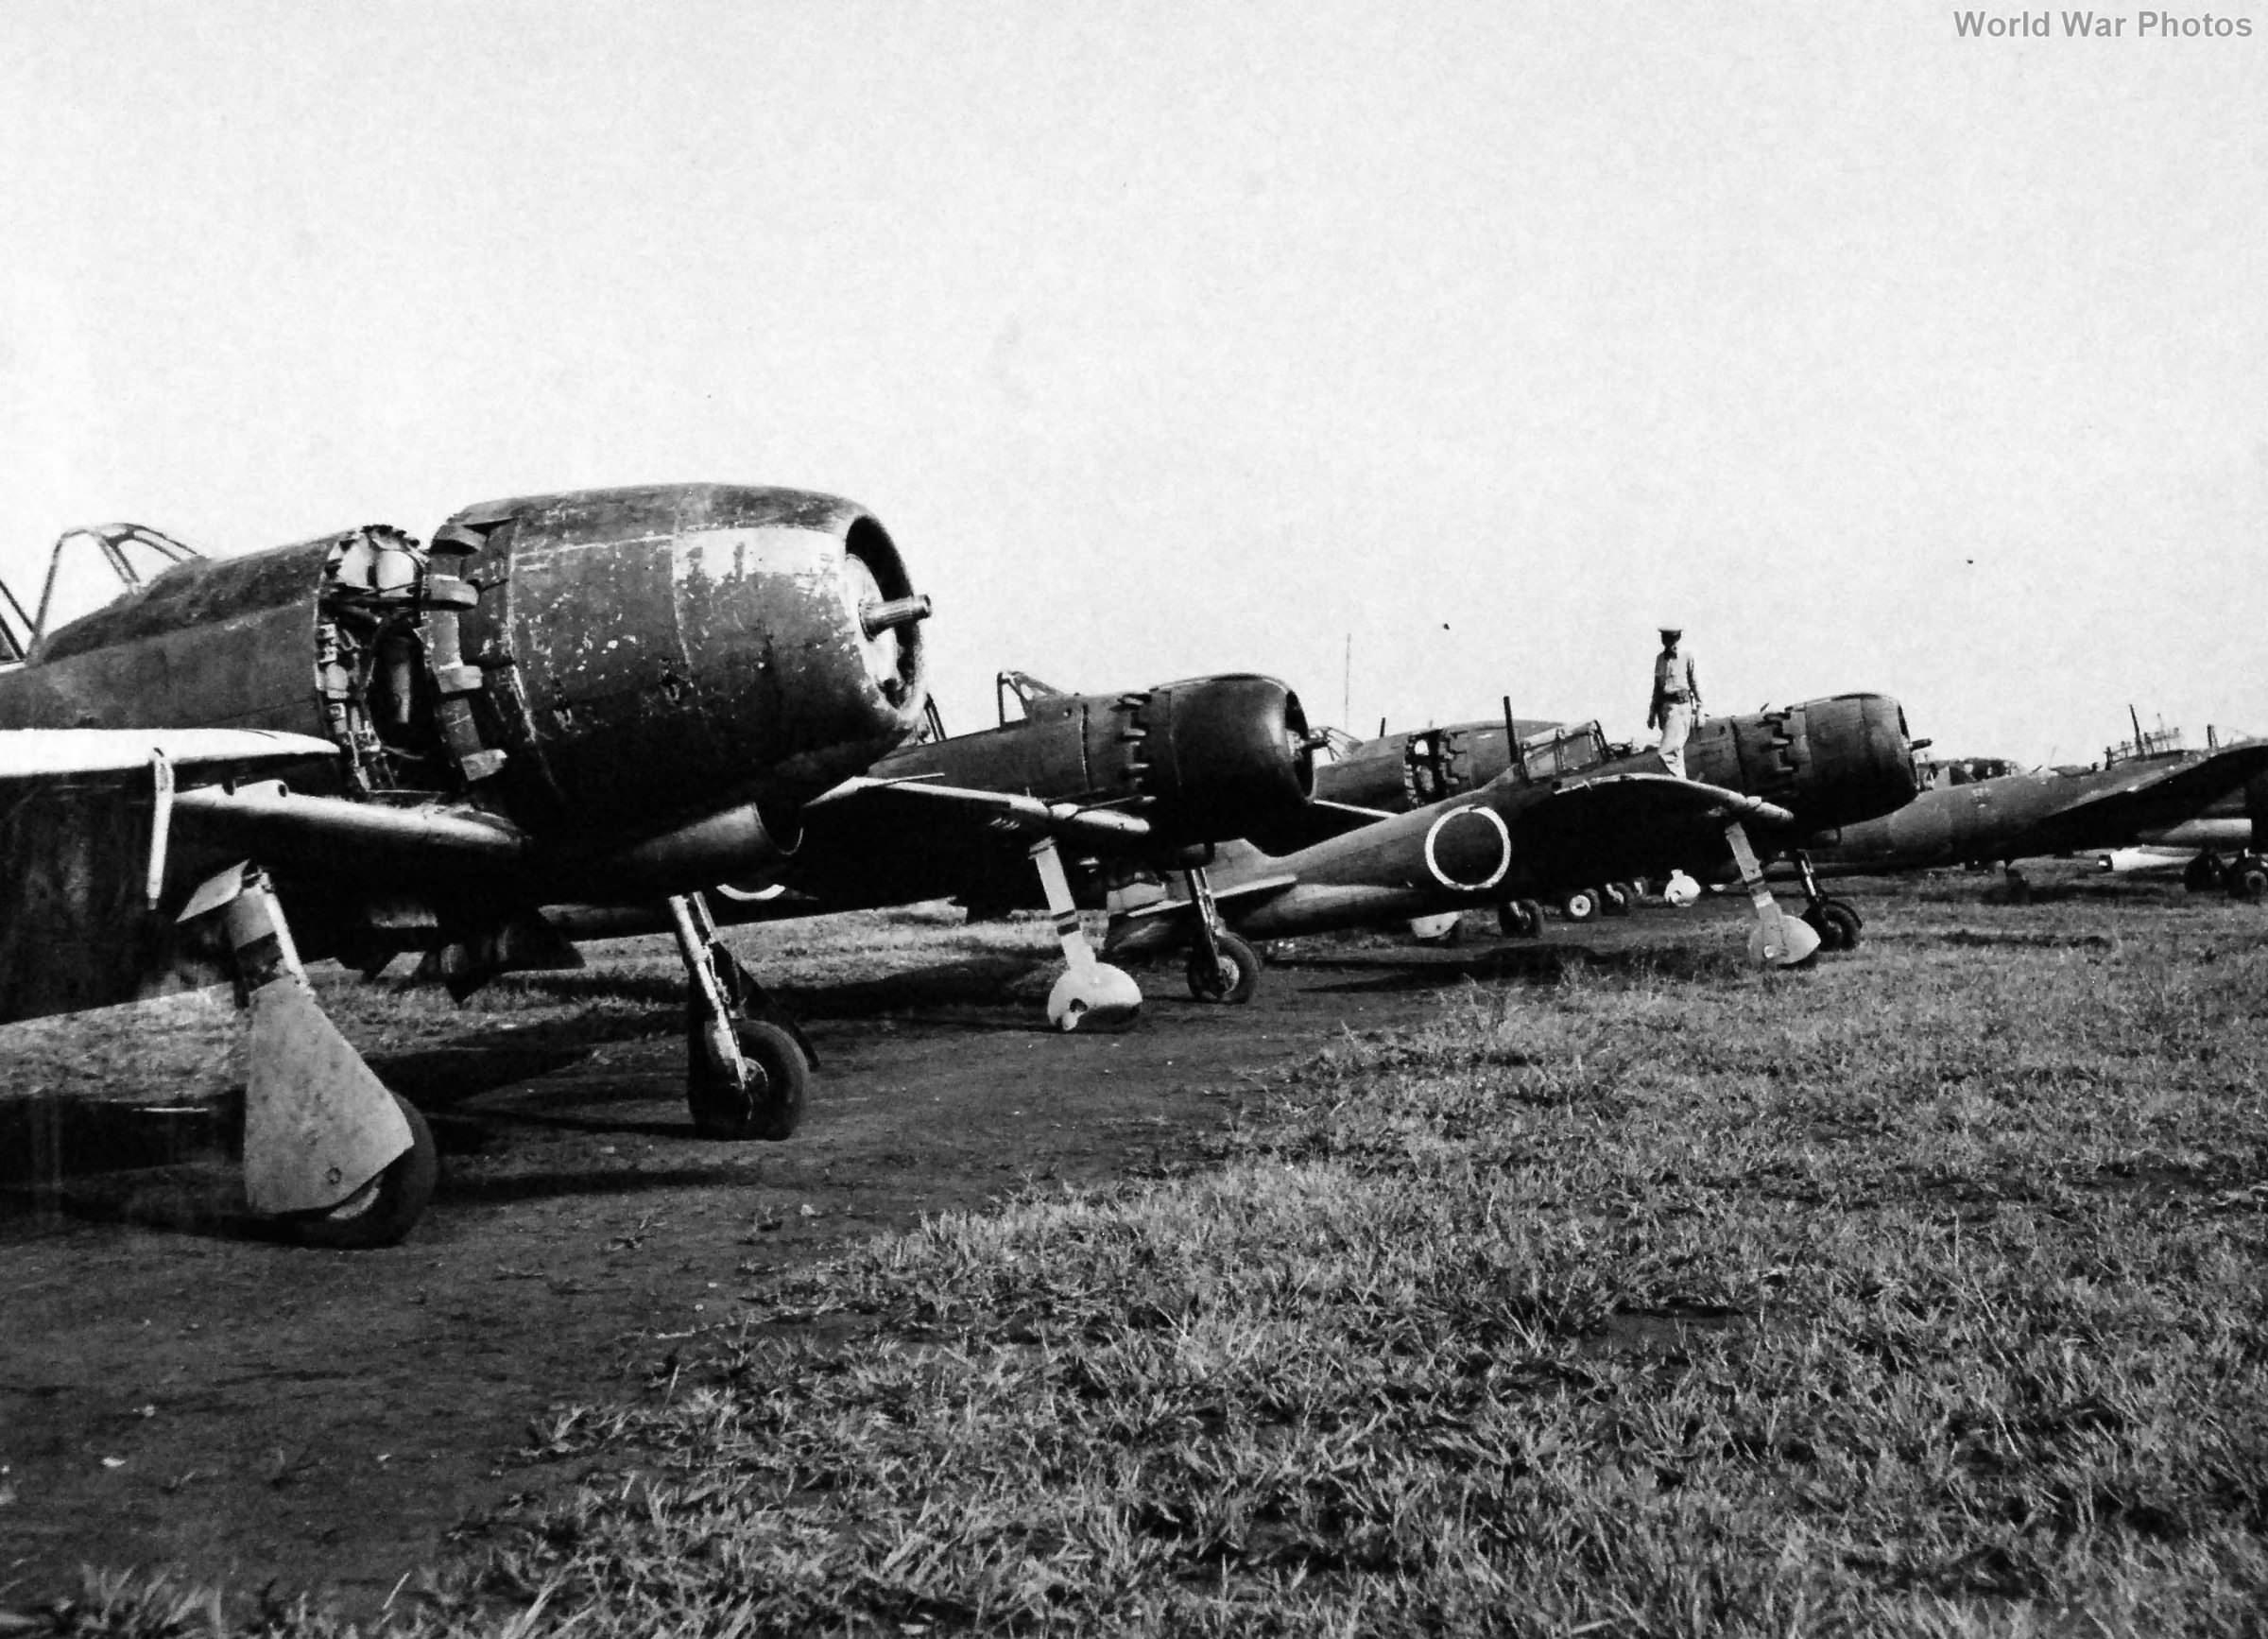 Captured J2M and A6M September 21, 1945